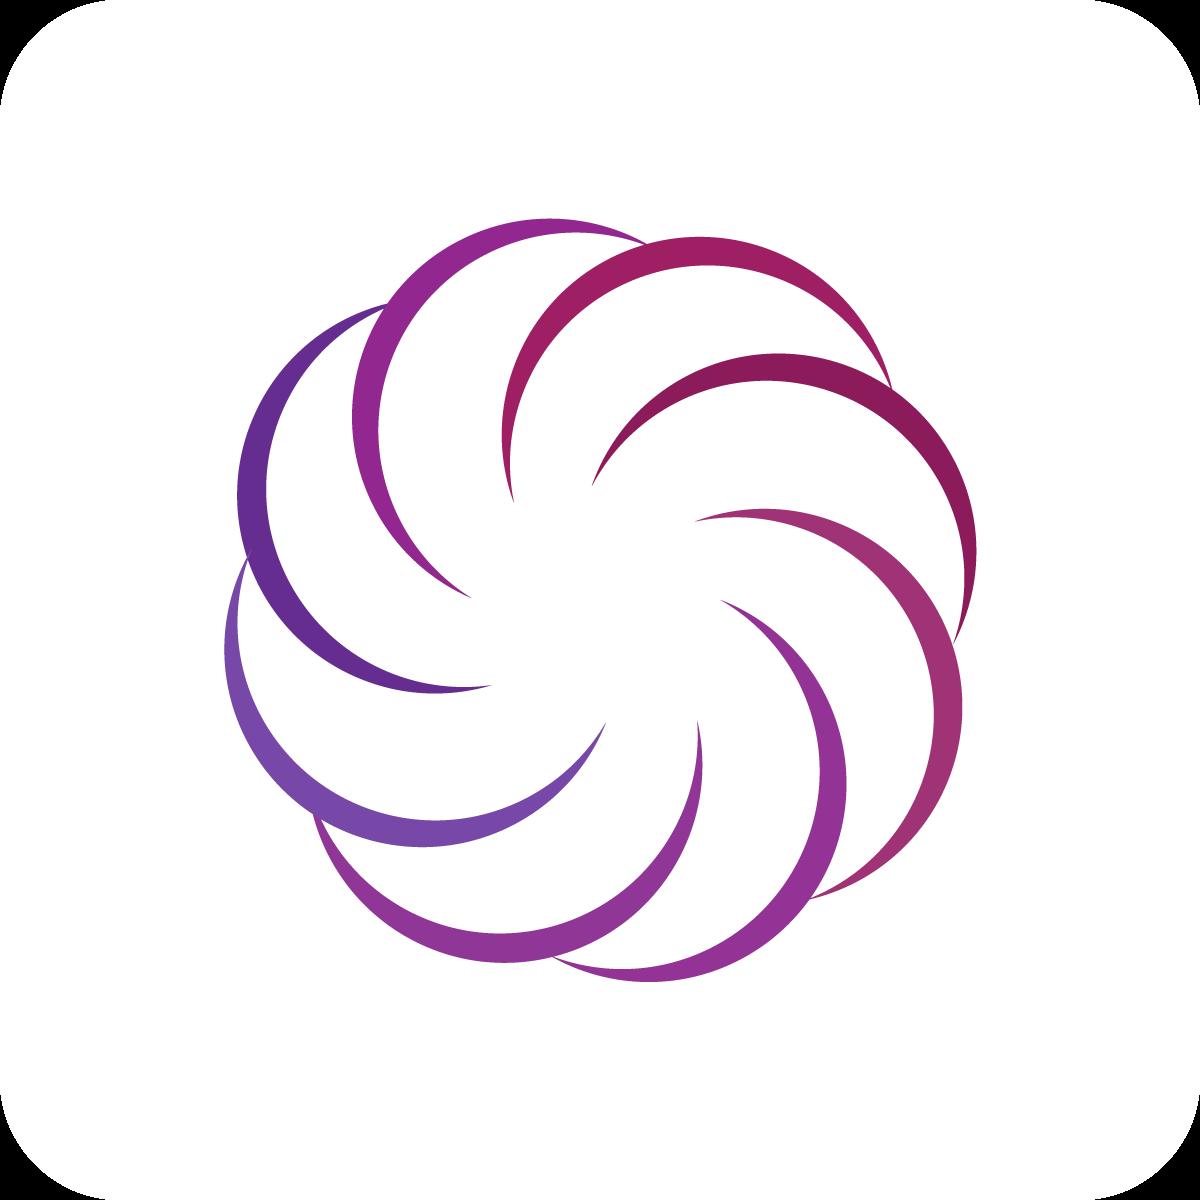 Разработать логотип и экран загрузки приложения фото f_1635ace38a865c51.png